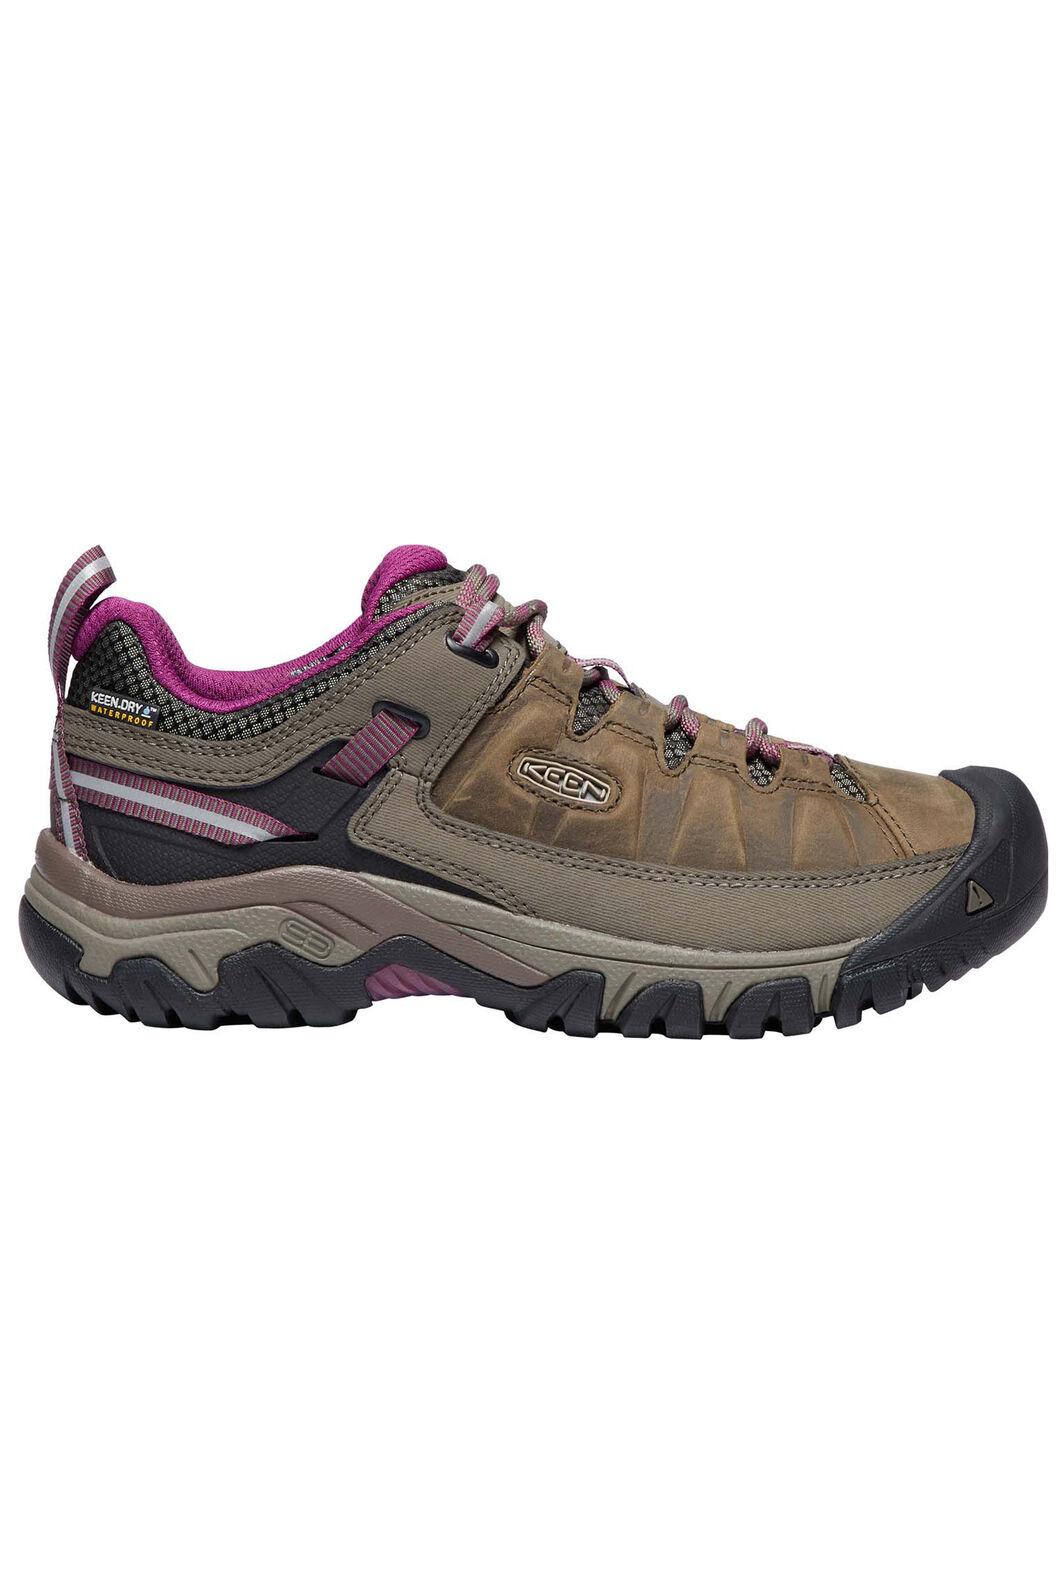 KEEN Women's Targhee III WP Hiking Shoes, Weiss/Boysenberry, hi-res